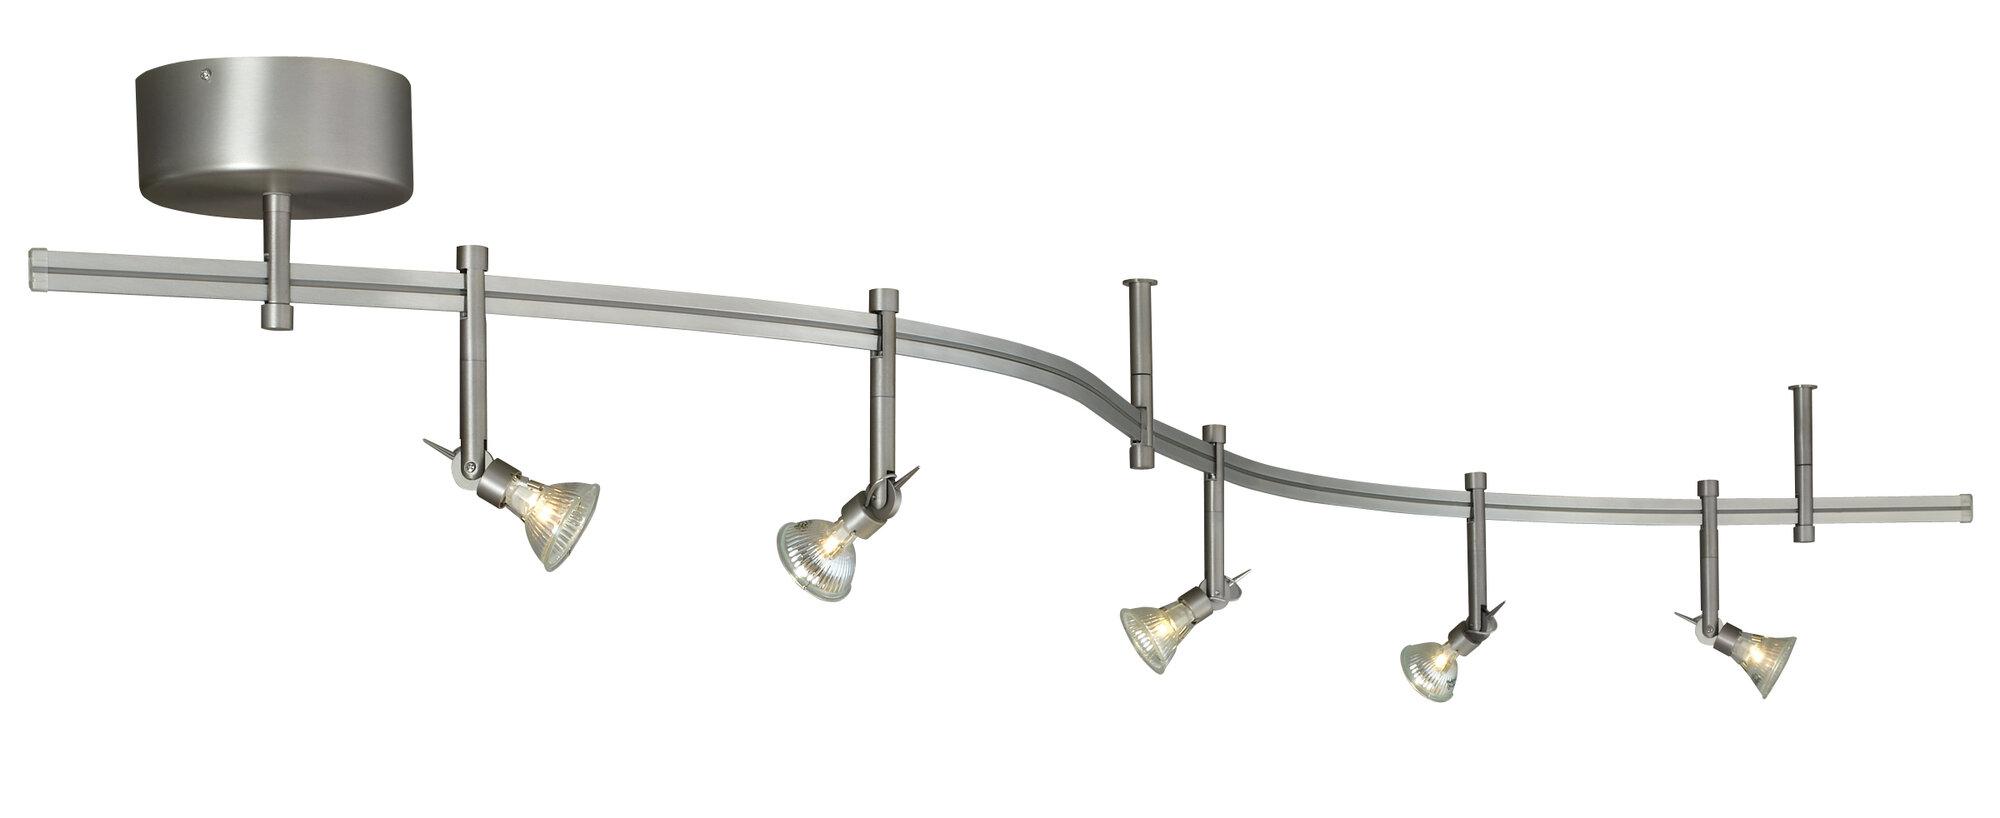 Tech lighting tiella 5 light decorative flexible track for Flexible track lighting ikea